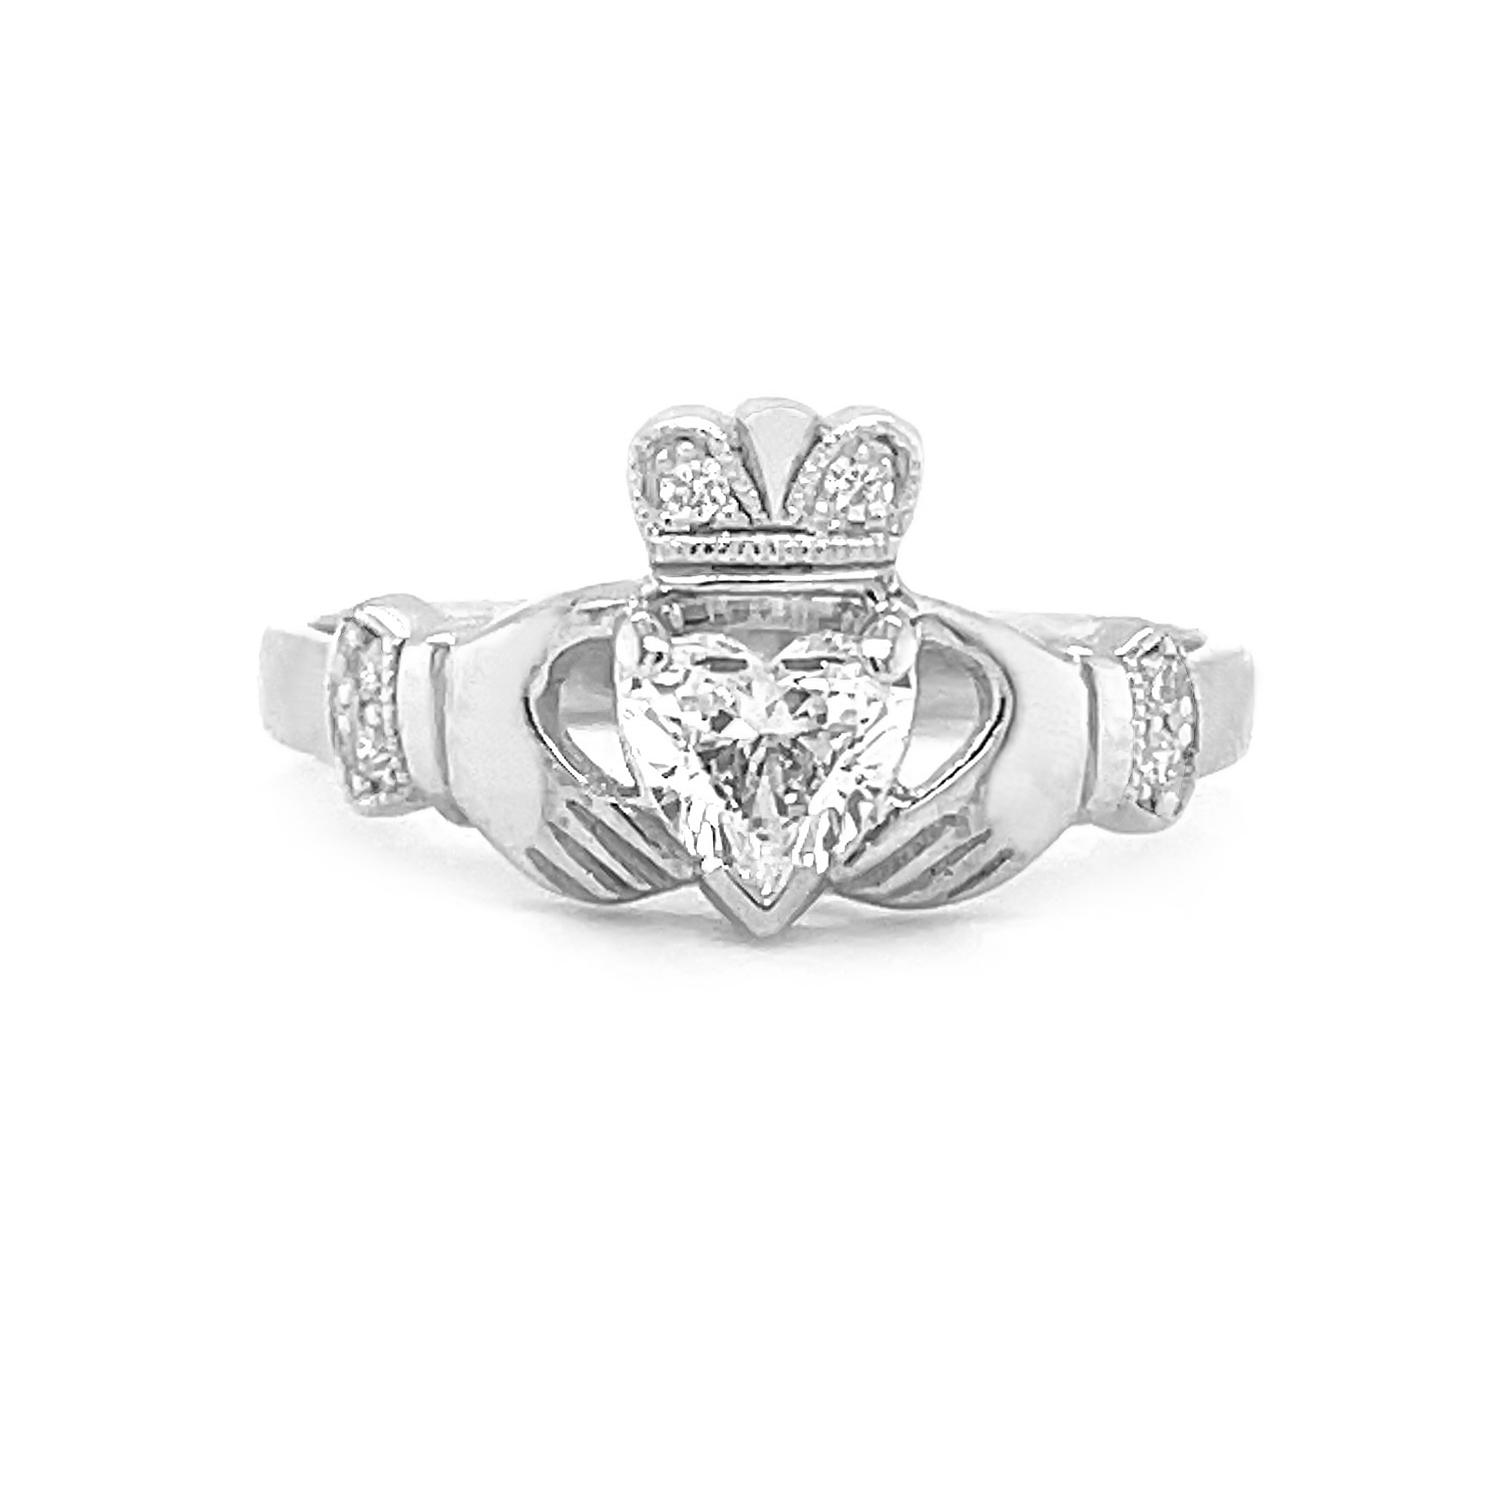 0.50cts HVS1 Diamond Ring